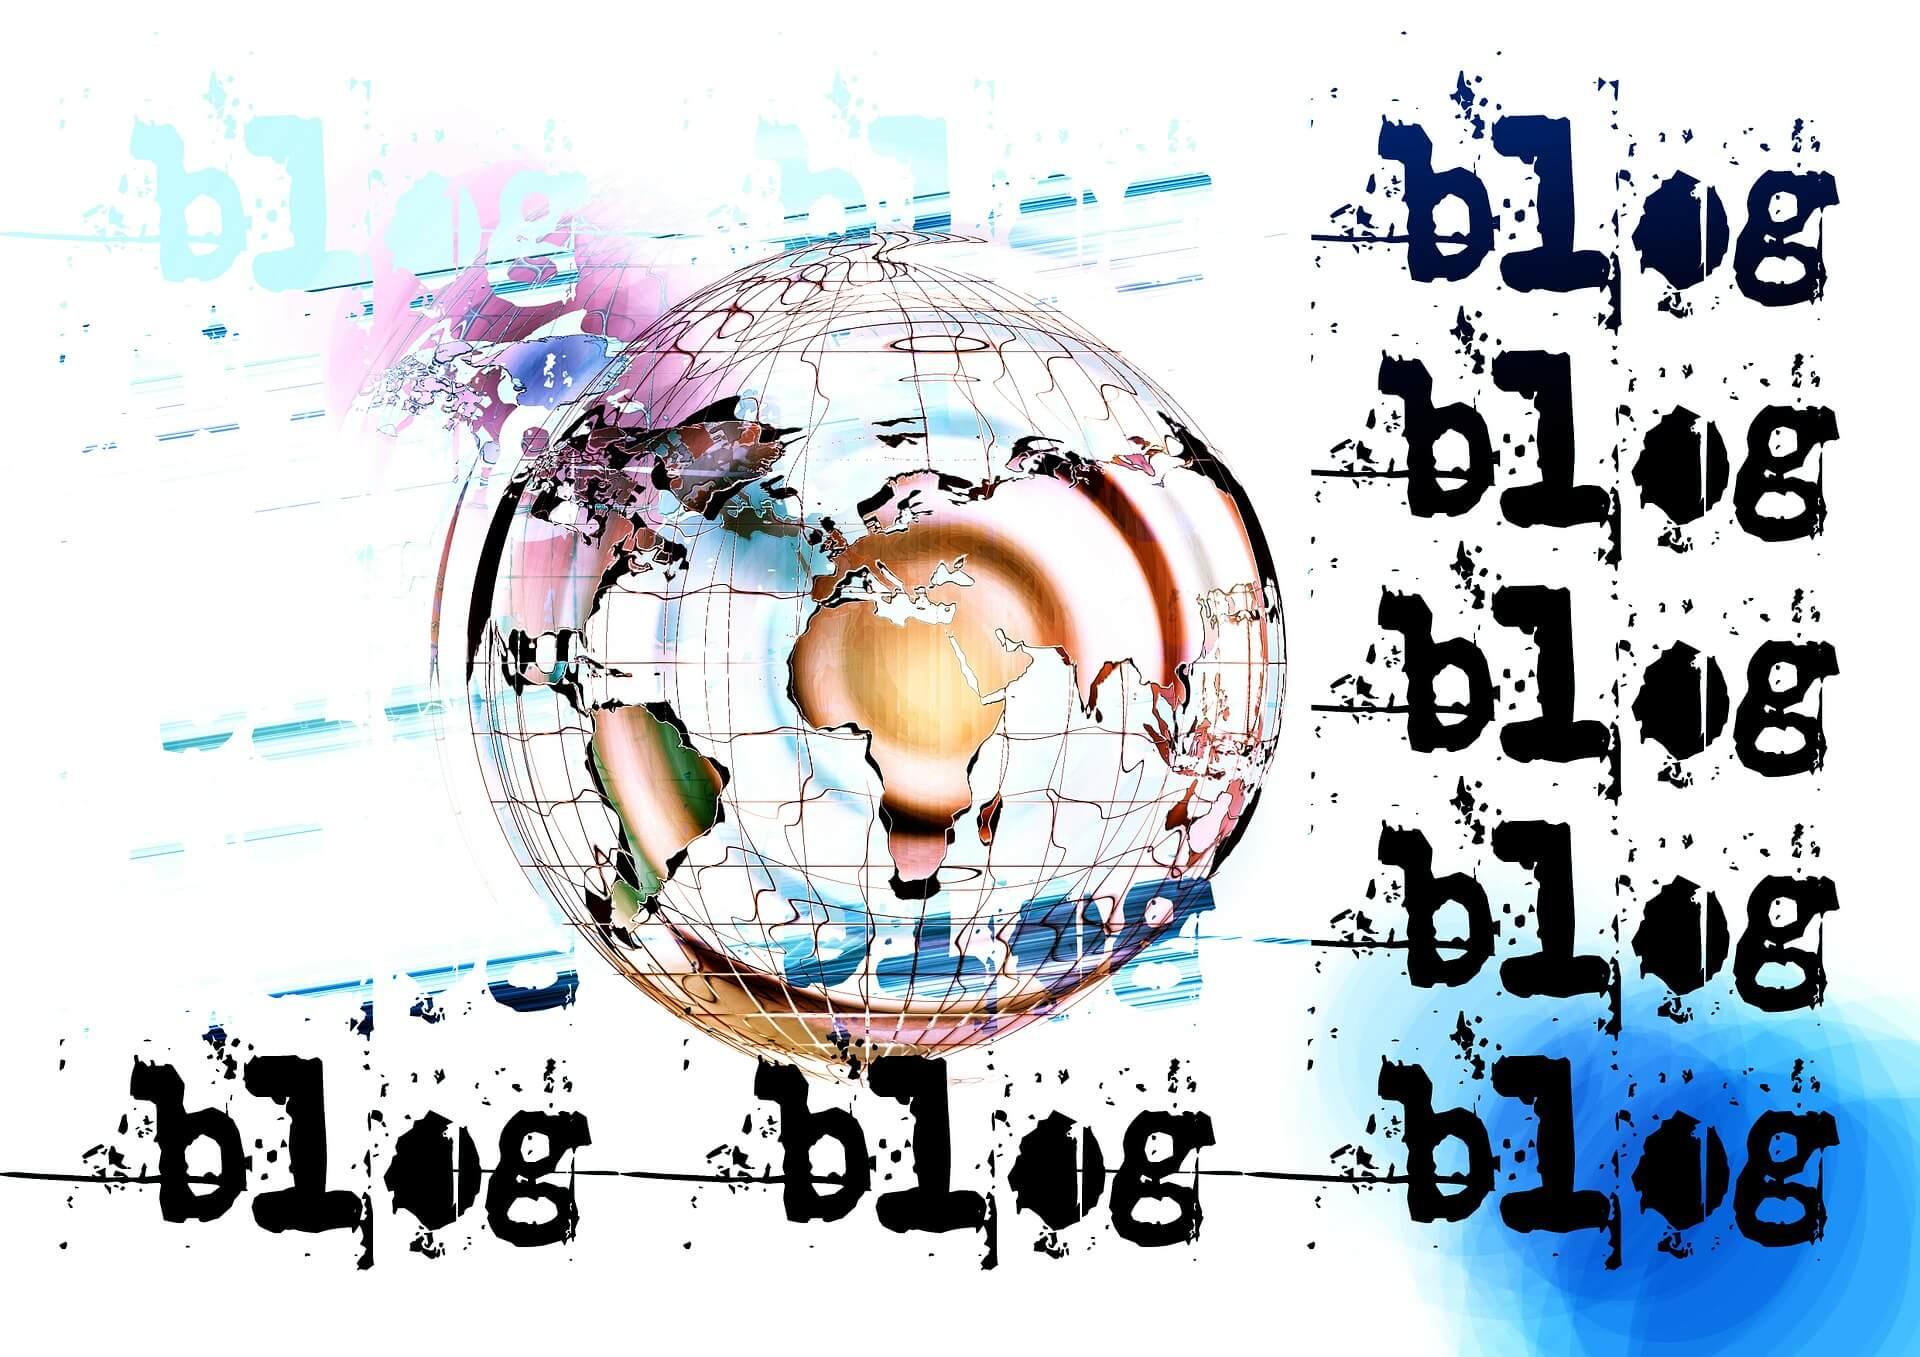 blog marketing is the way forward